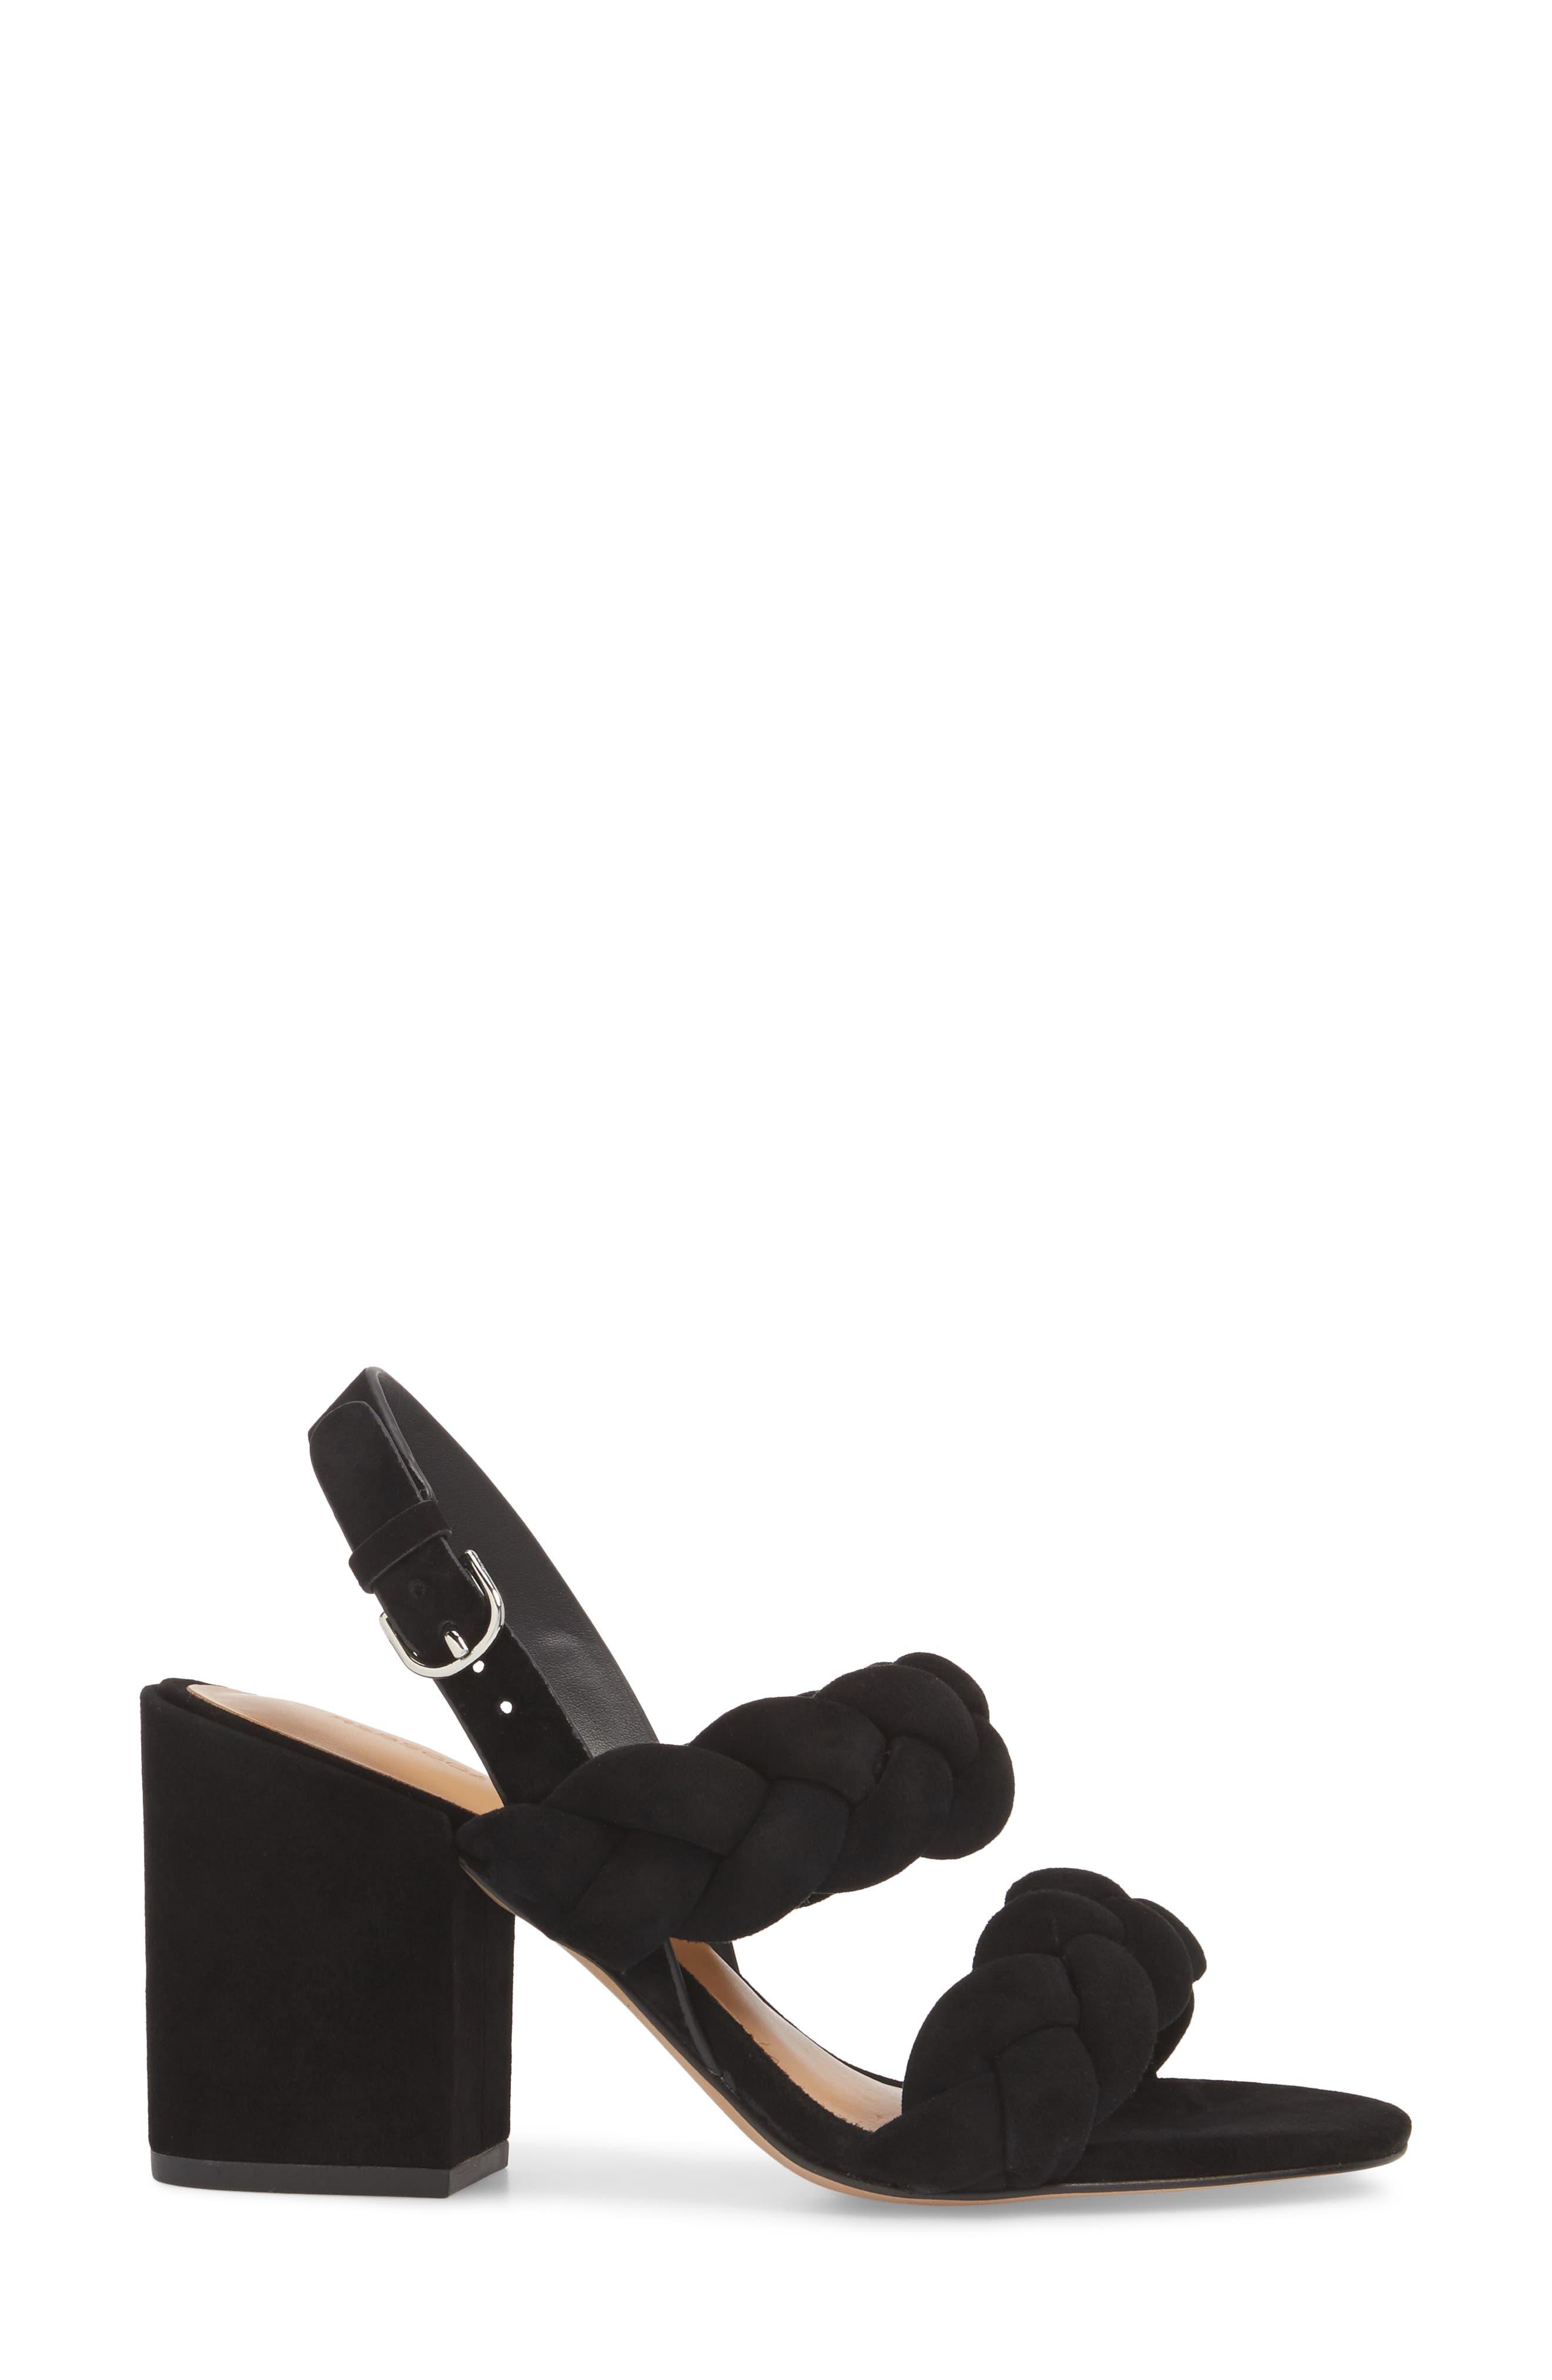 Candance Block Heel Sandal,                             Alternate thumbnail 3, color,                             BLACK LEATHER